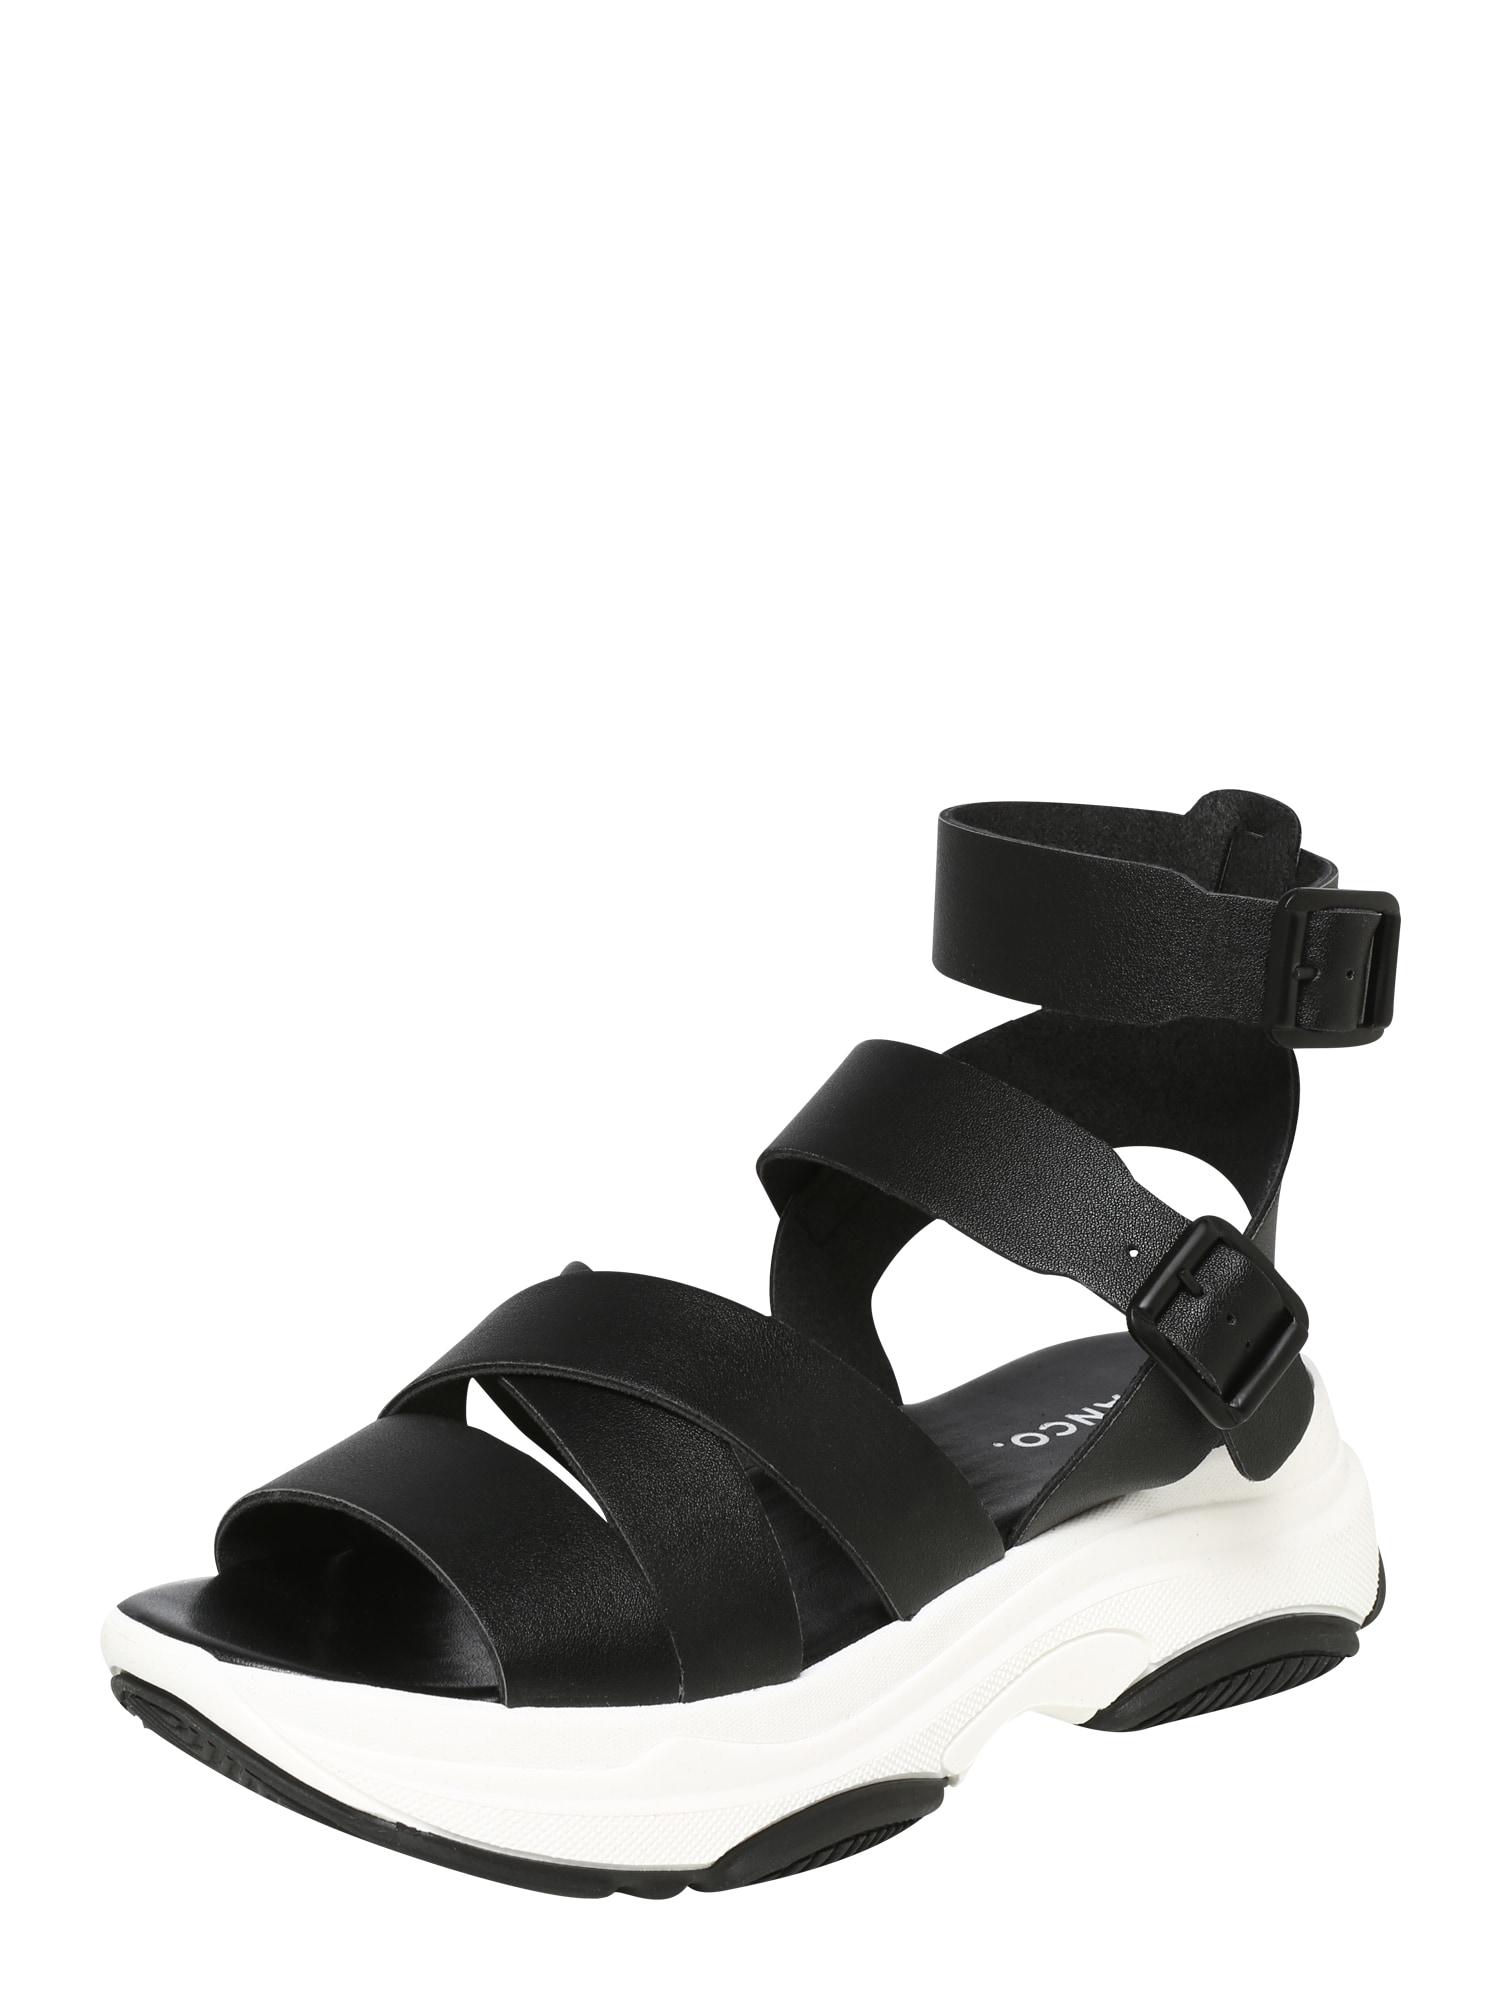 Sandály Biaalia černá bílá Bianco